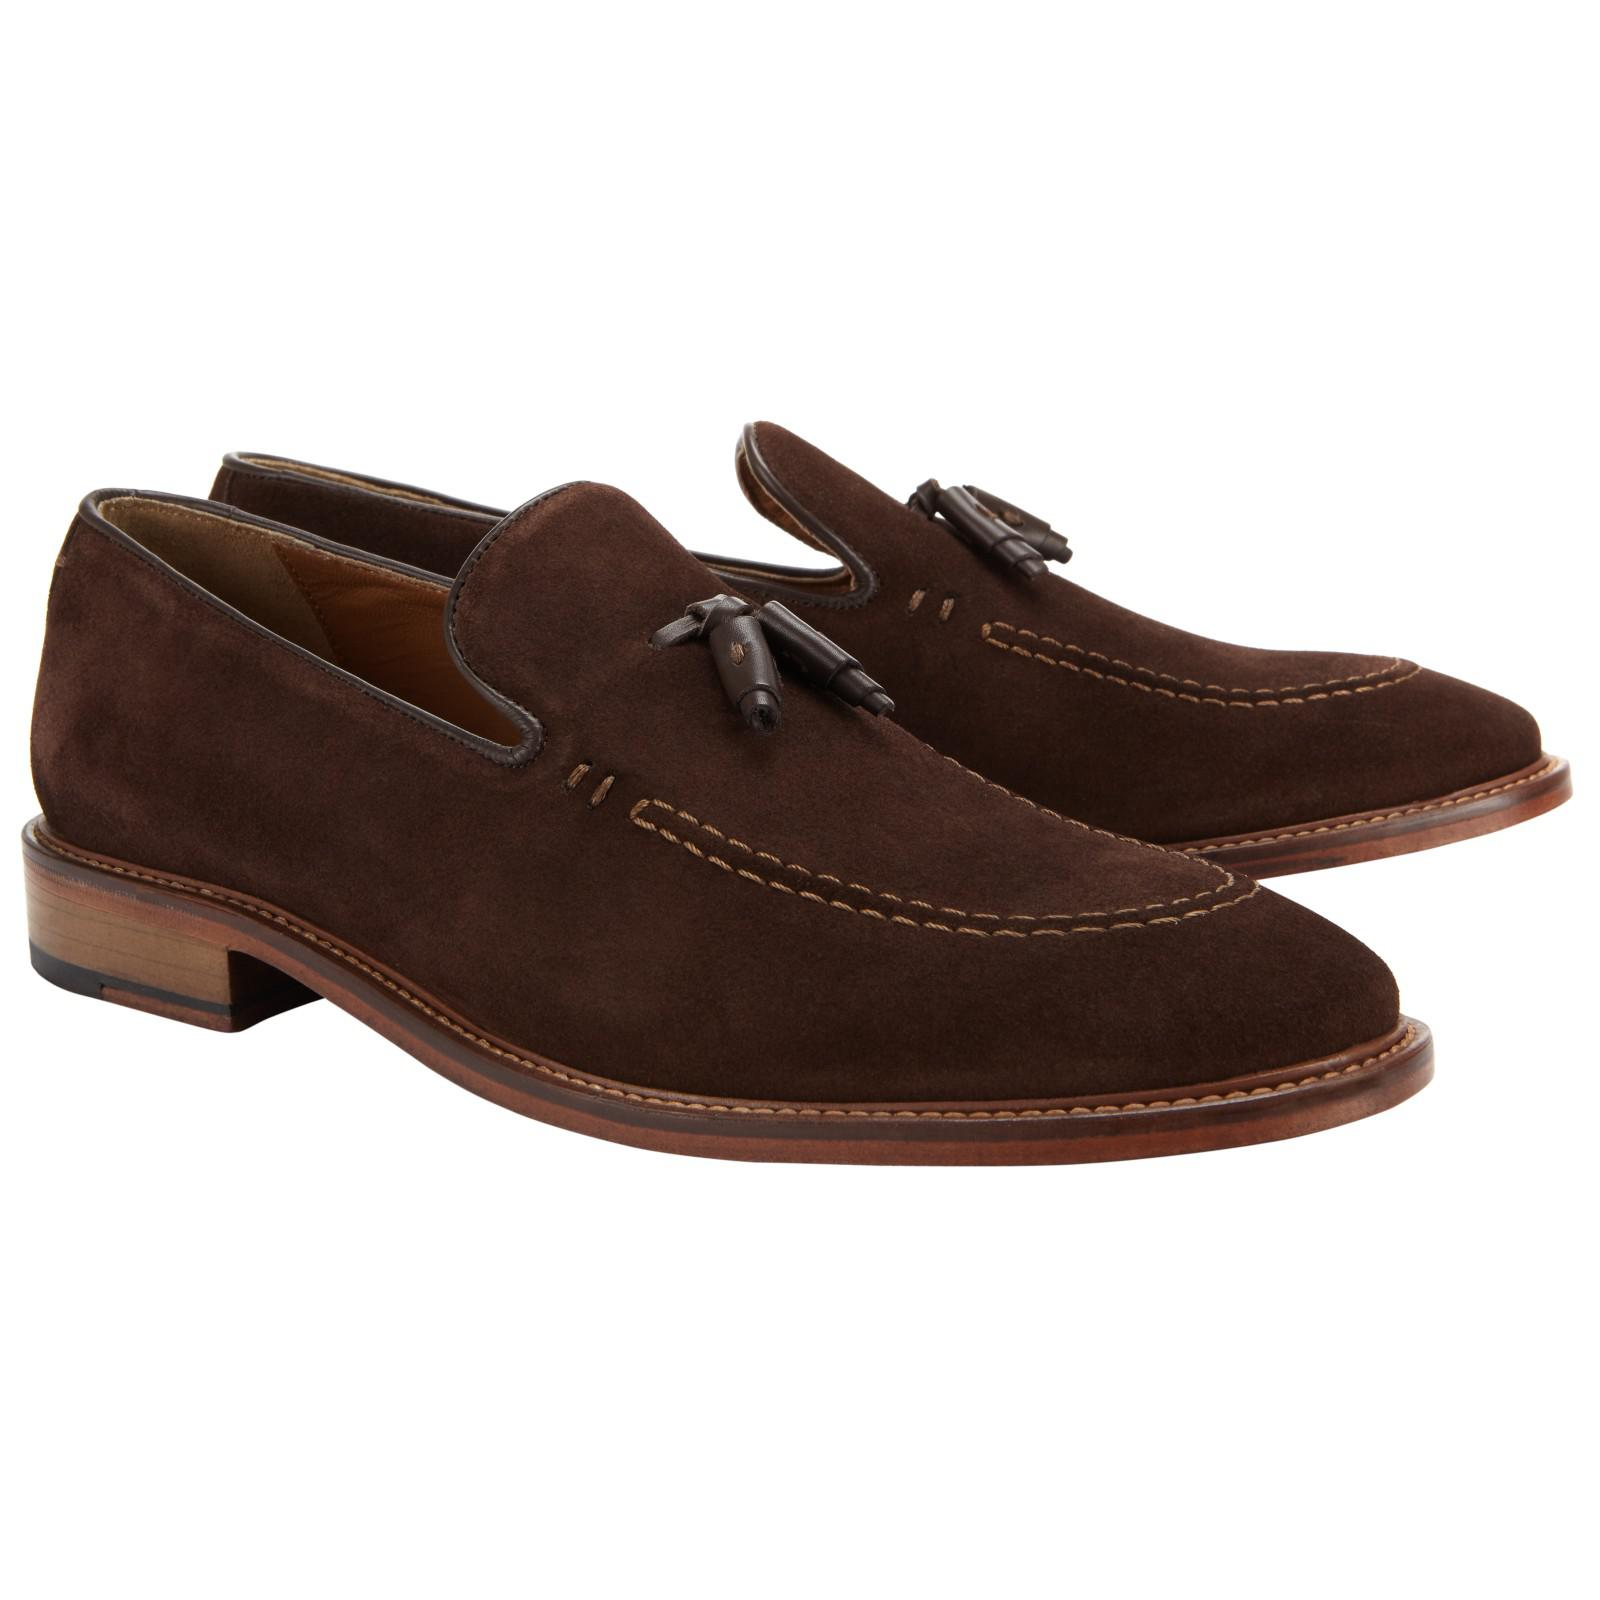 John Lewis Suede Tassel Loafers in Brown for Men